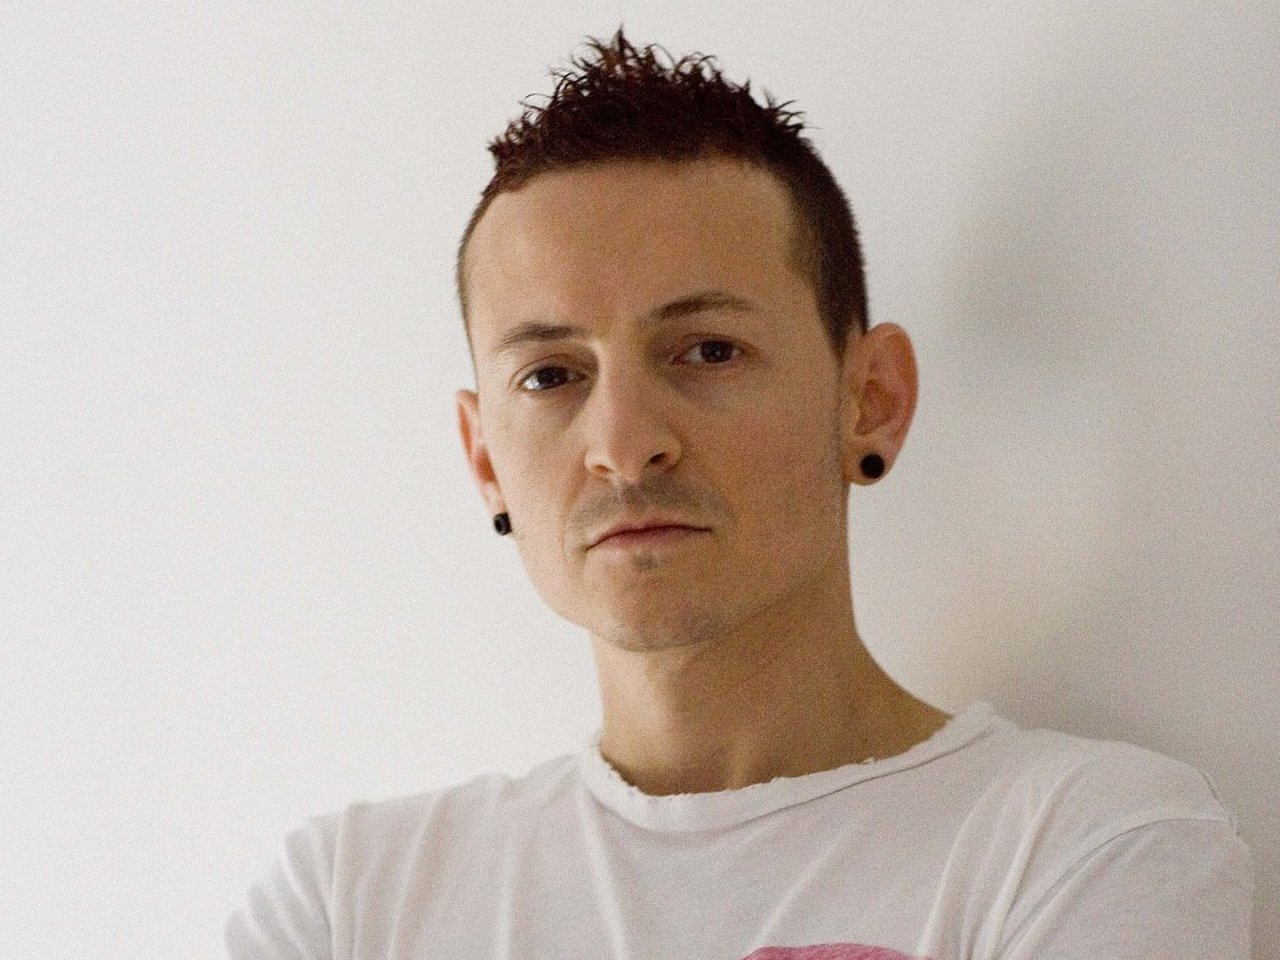 Se habría suicidado Chester Bennington de Linkin Park